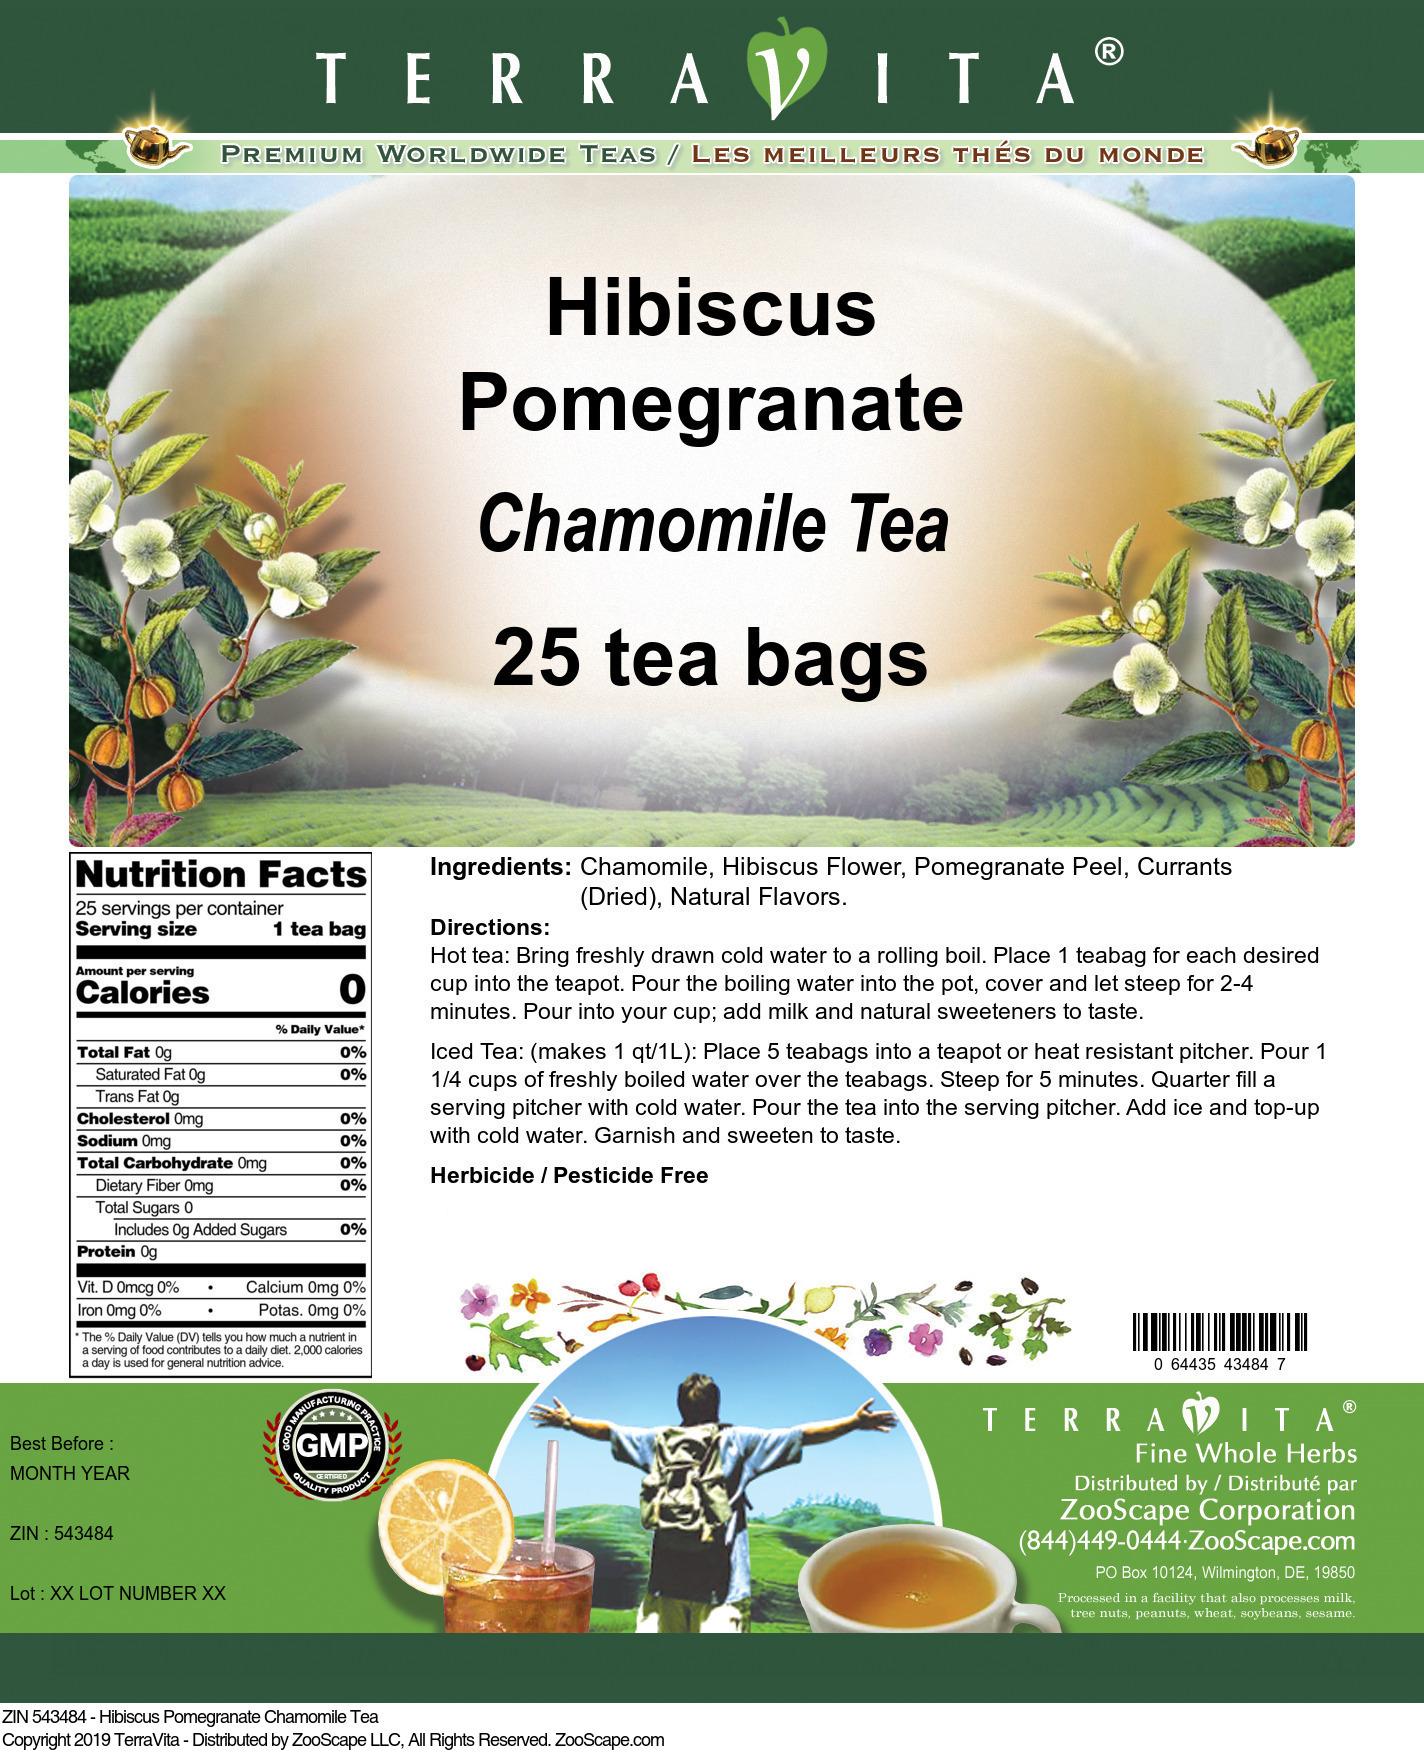 Hibiscus Pomegranate Chamomile Tea